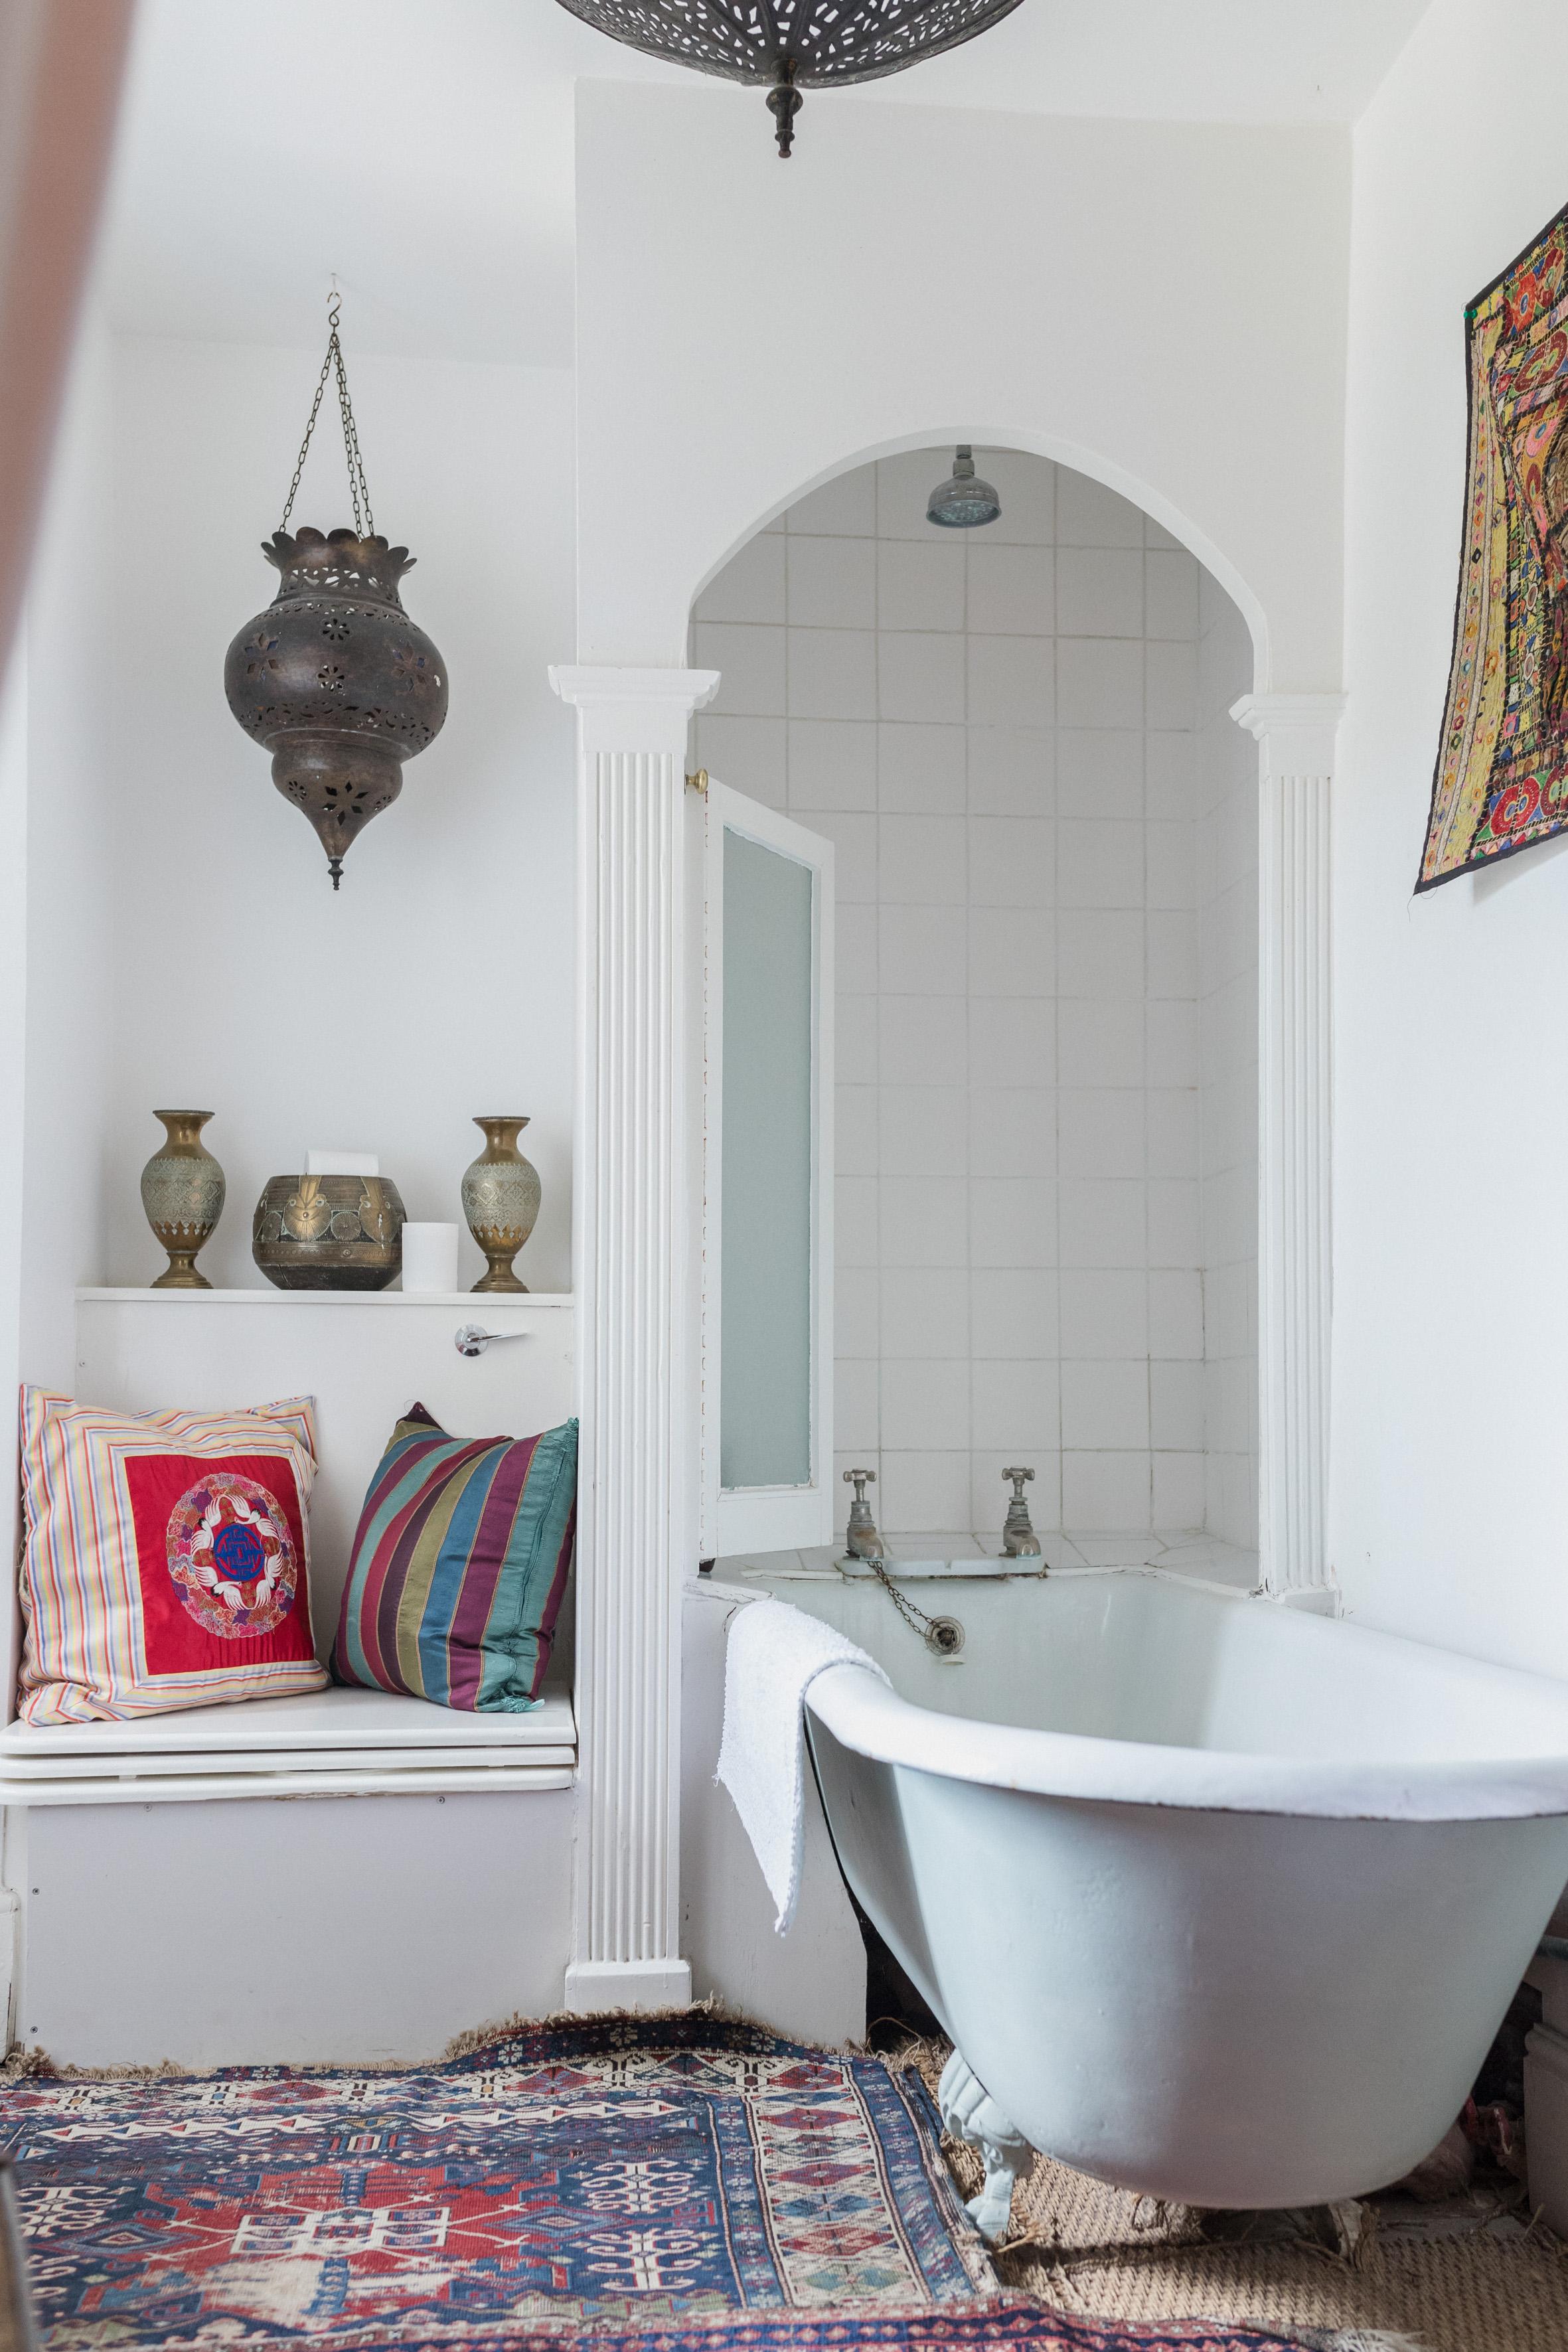 _Moroccan room jpg.jpg